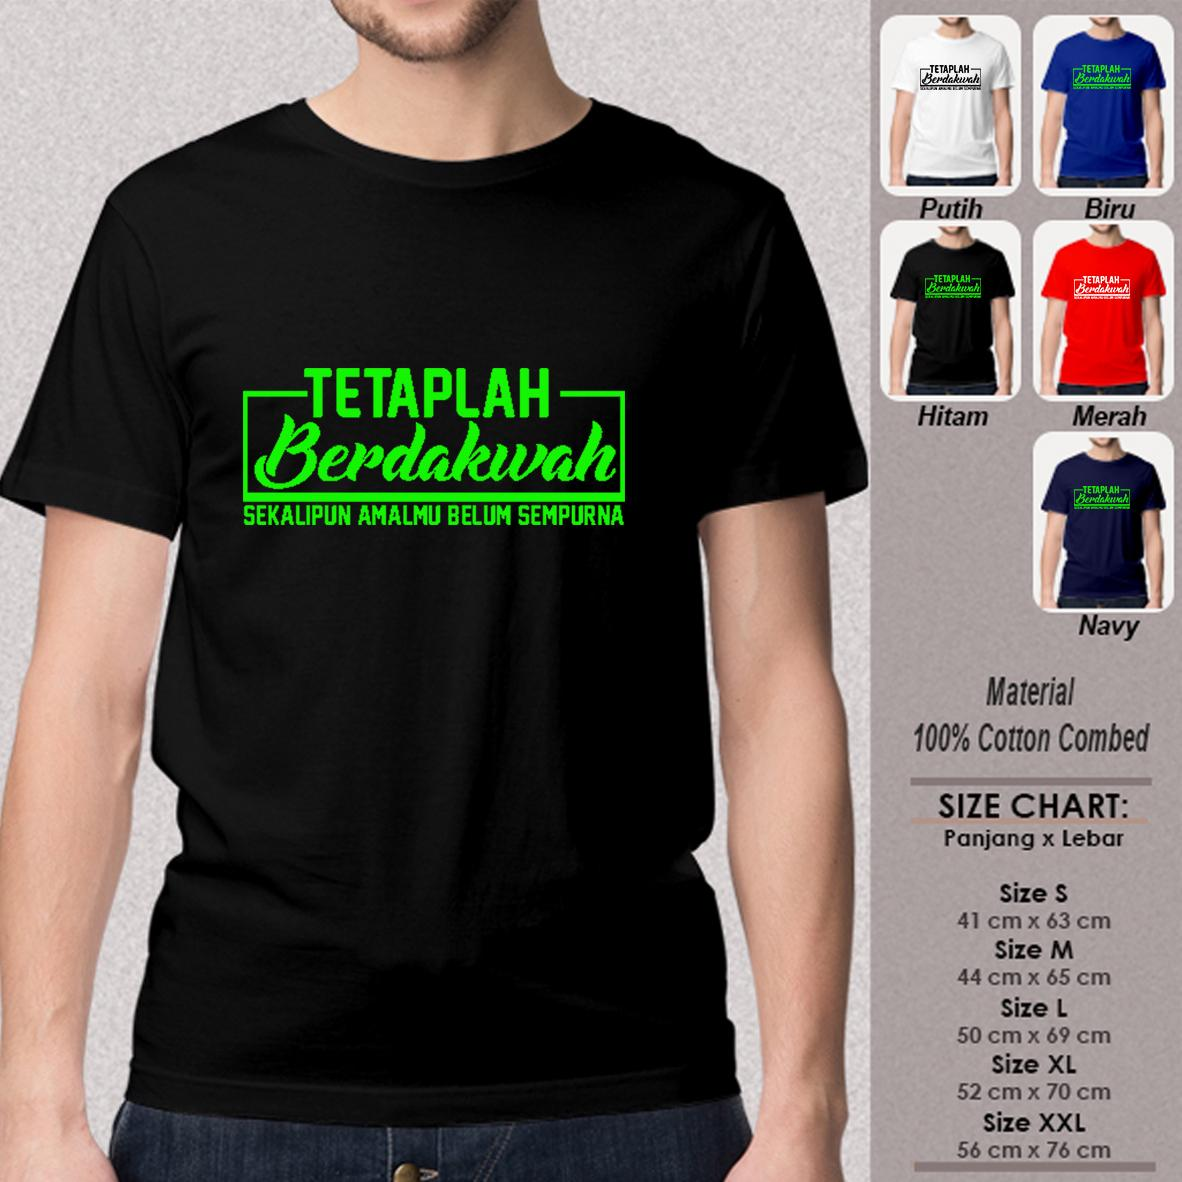 Harga Suppliernatgeo Kaos T Shirt Distro Pria Tshirt Hrcn H 1021 Black Kurta